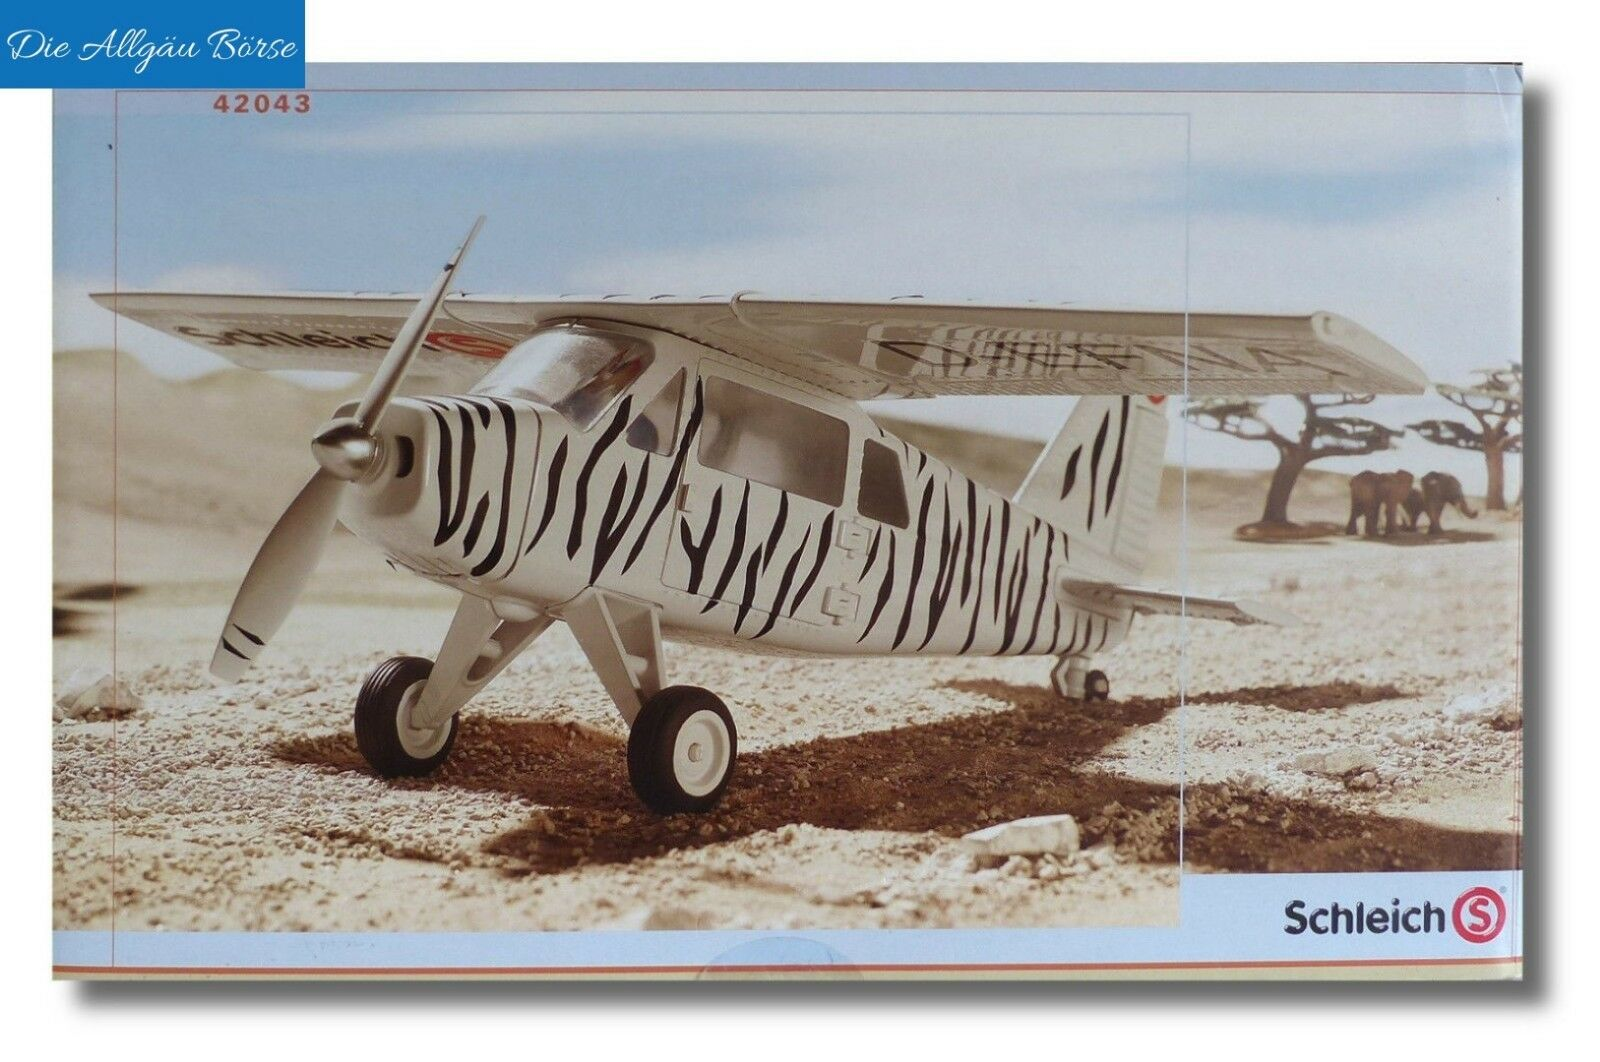 SCHLEICH 42043 Safari AEREO WILD LIFE Expedition Africa NUOVO OVP